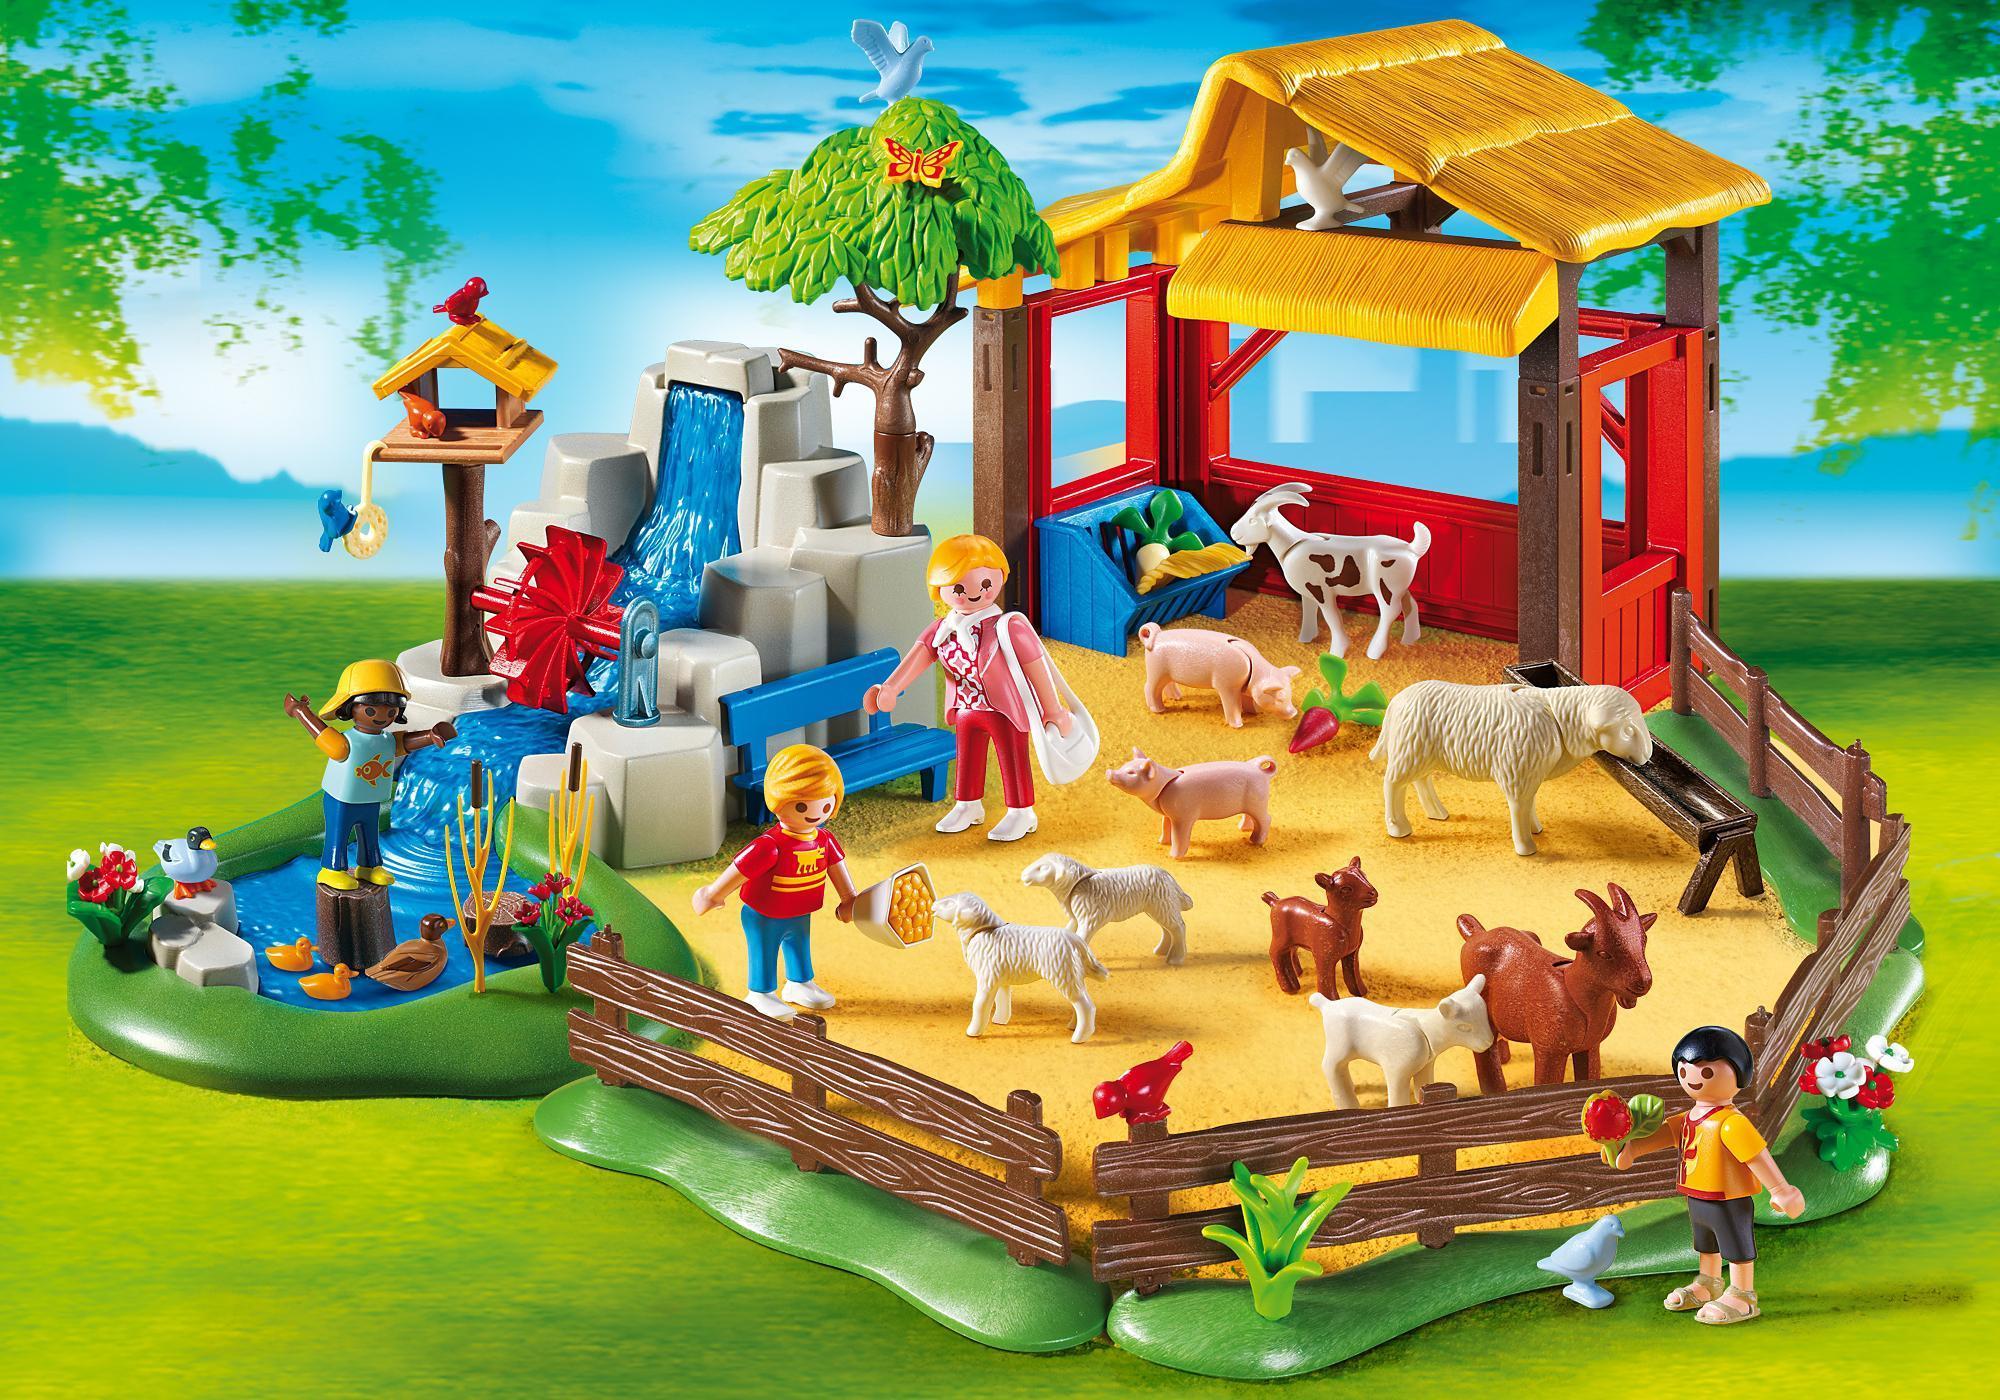 http://media.playmobil.com/i/playmobil/4851_product_detail/Streichelzoo